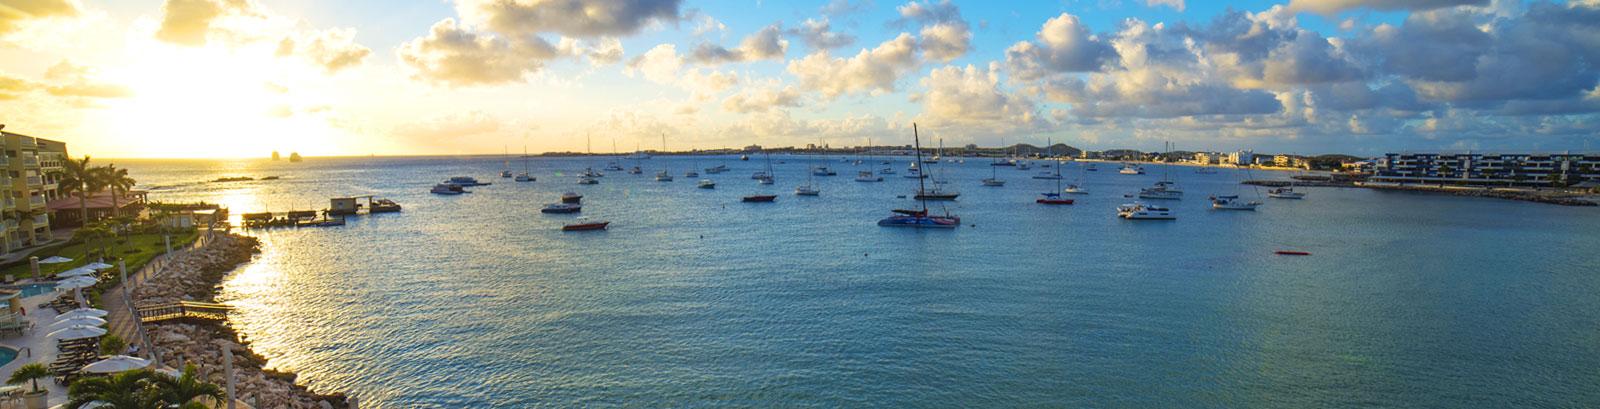 Activités à Simpson Bay Resort & Marina